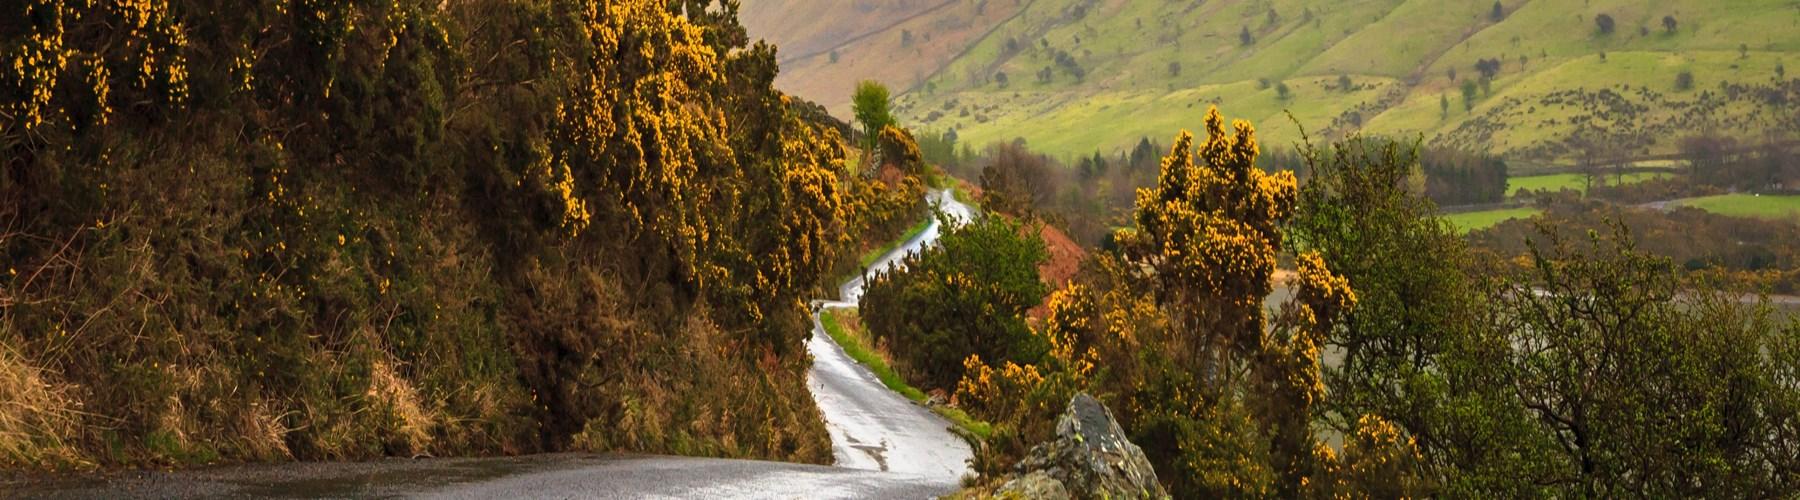 Narrow winding road through green hills